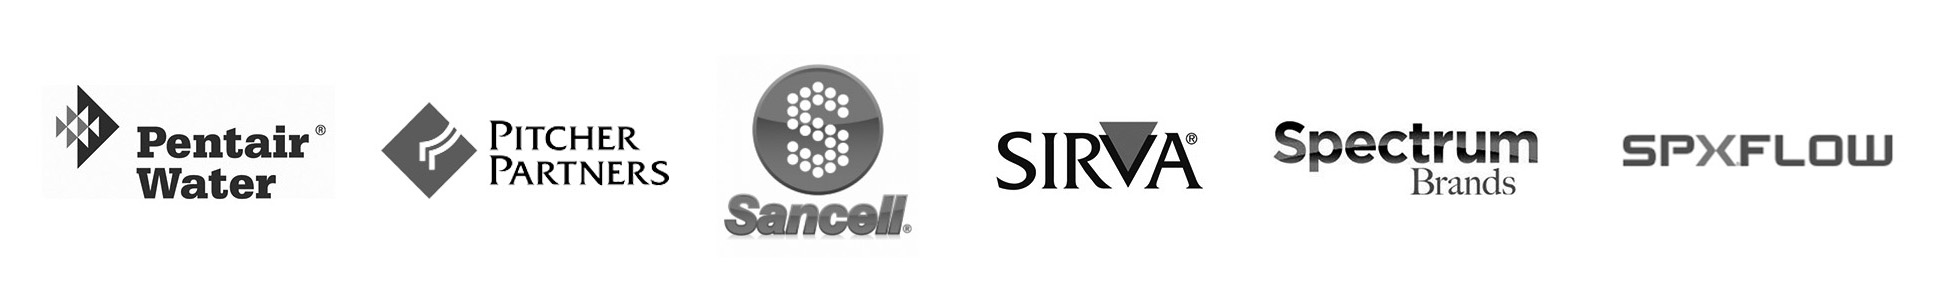 client-logos-6.jpg